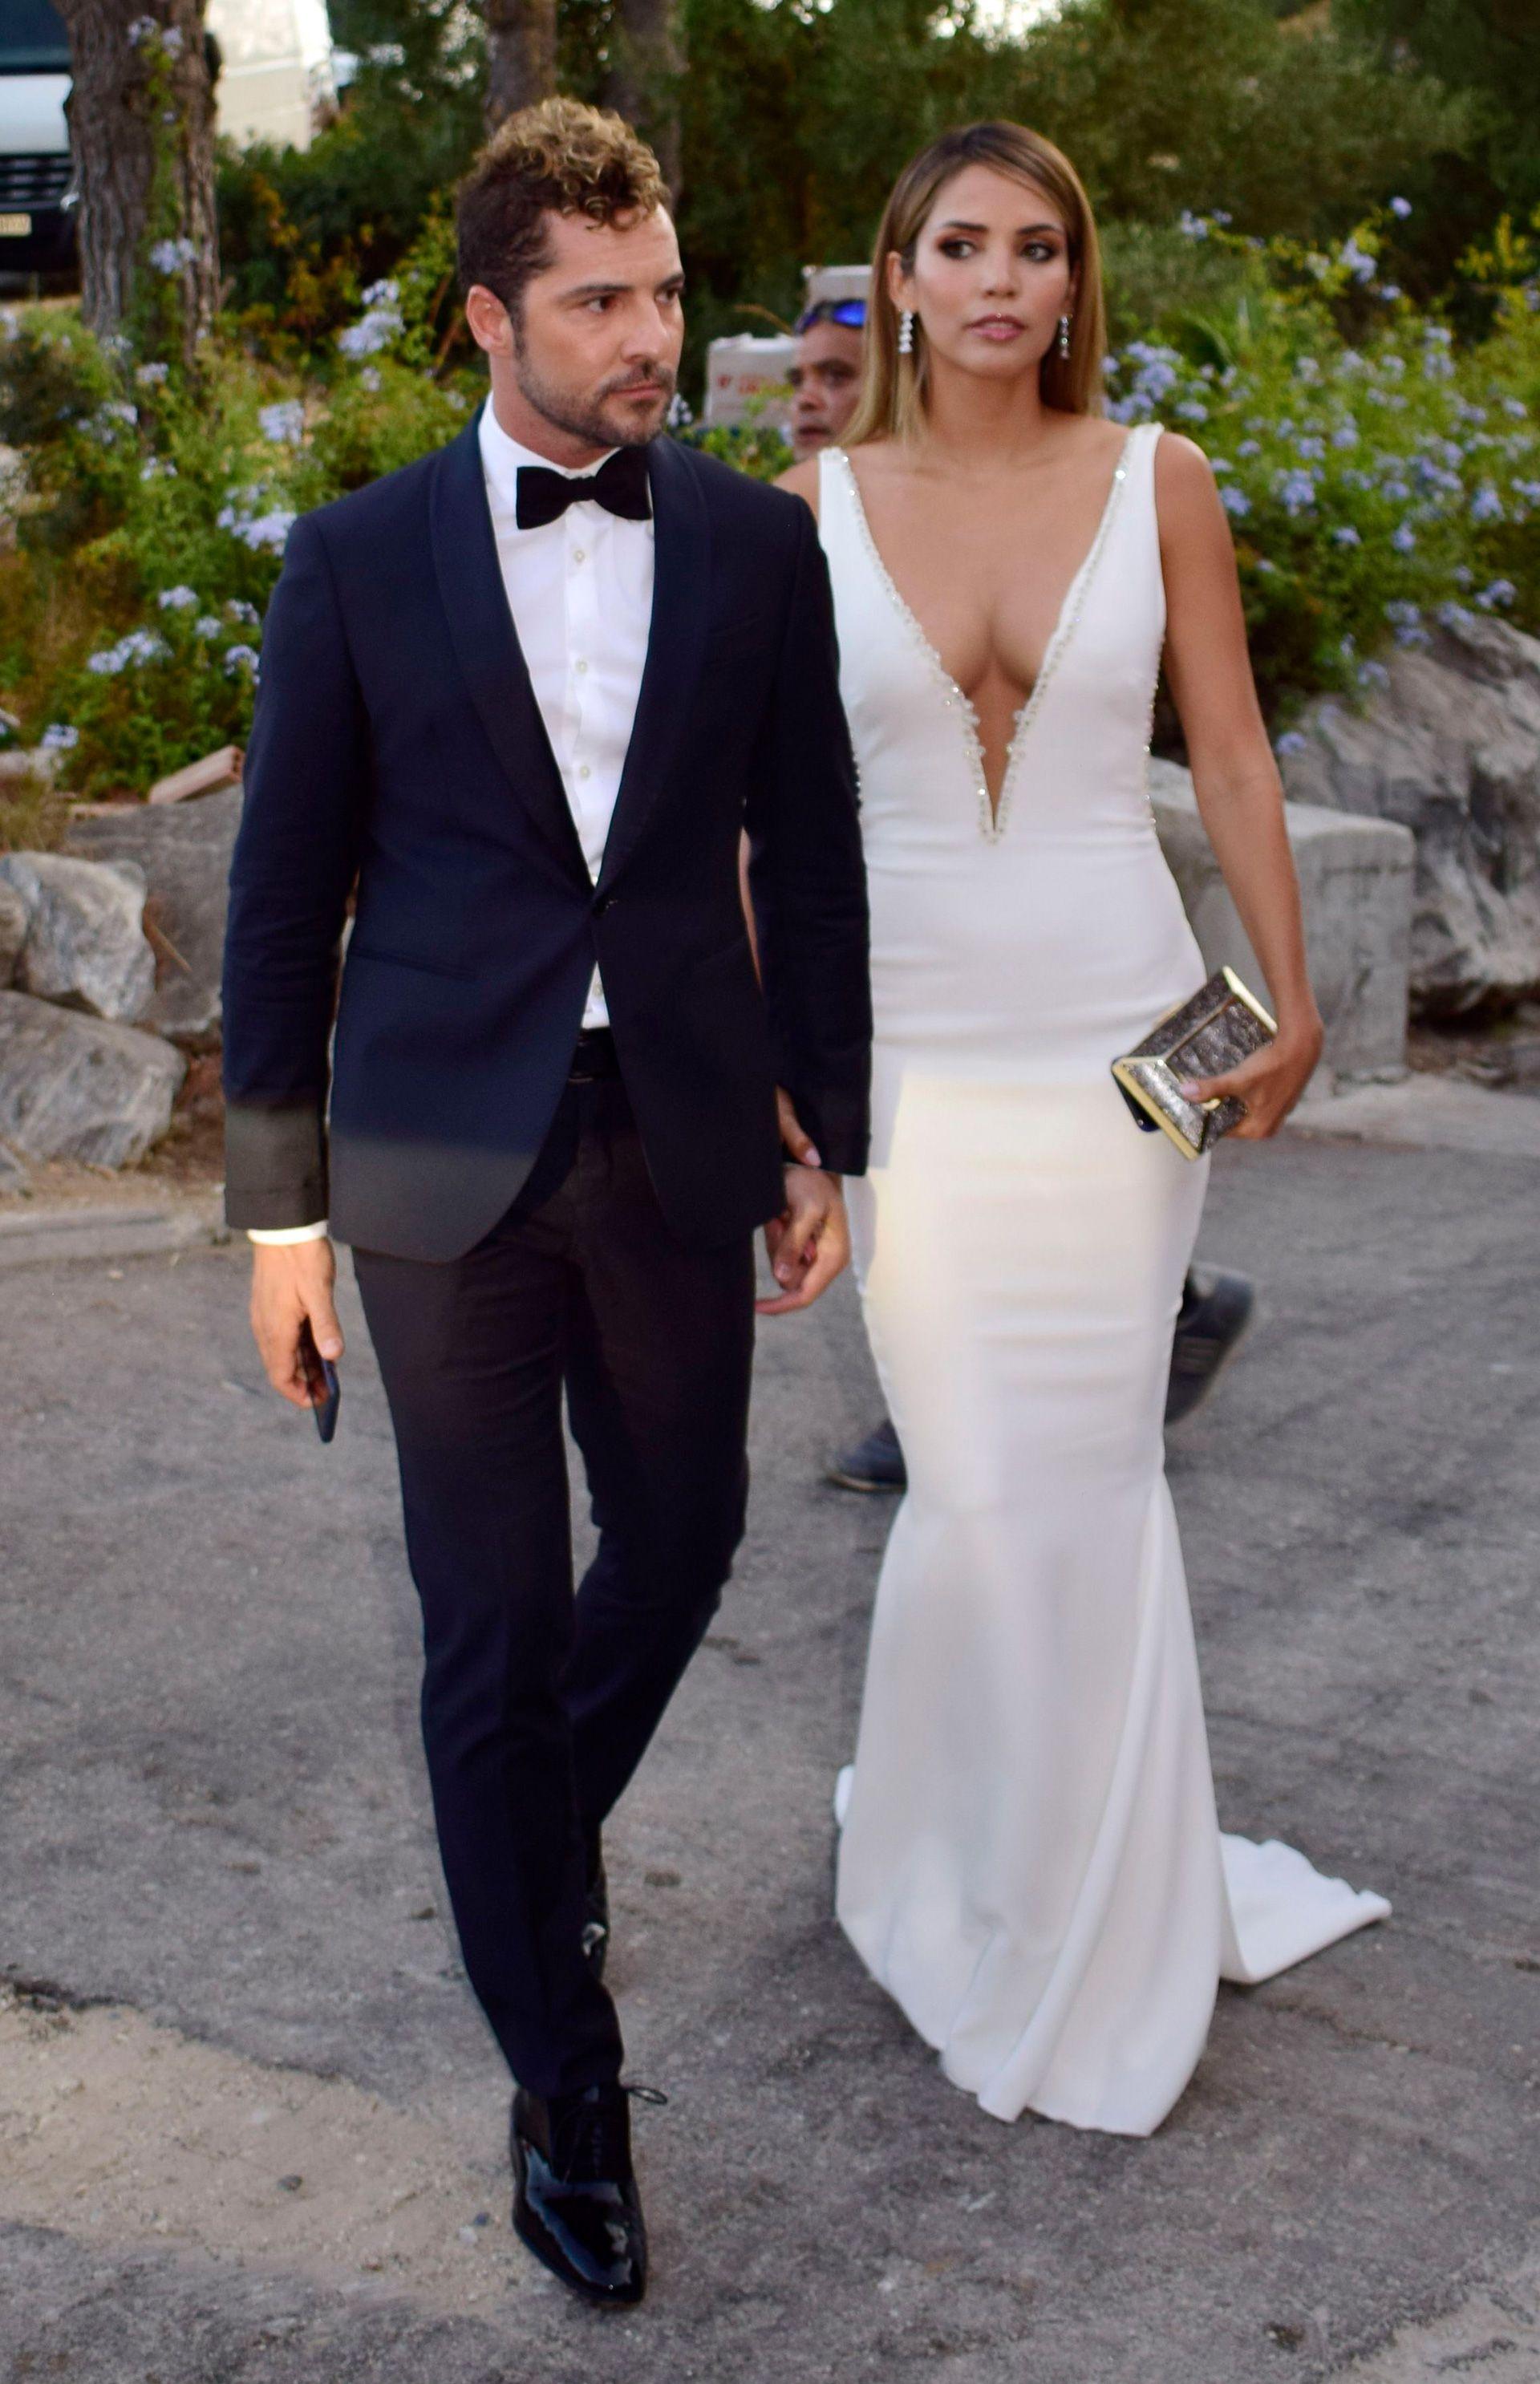 David Bisbal y Rosanna Zanetti están casados desde el 2018 (Foto: Lorenzo Carnero/ZUMA Wire/Shutterstock -9788618g-)